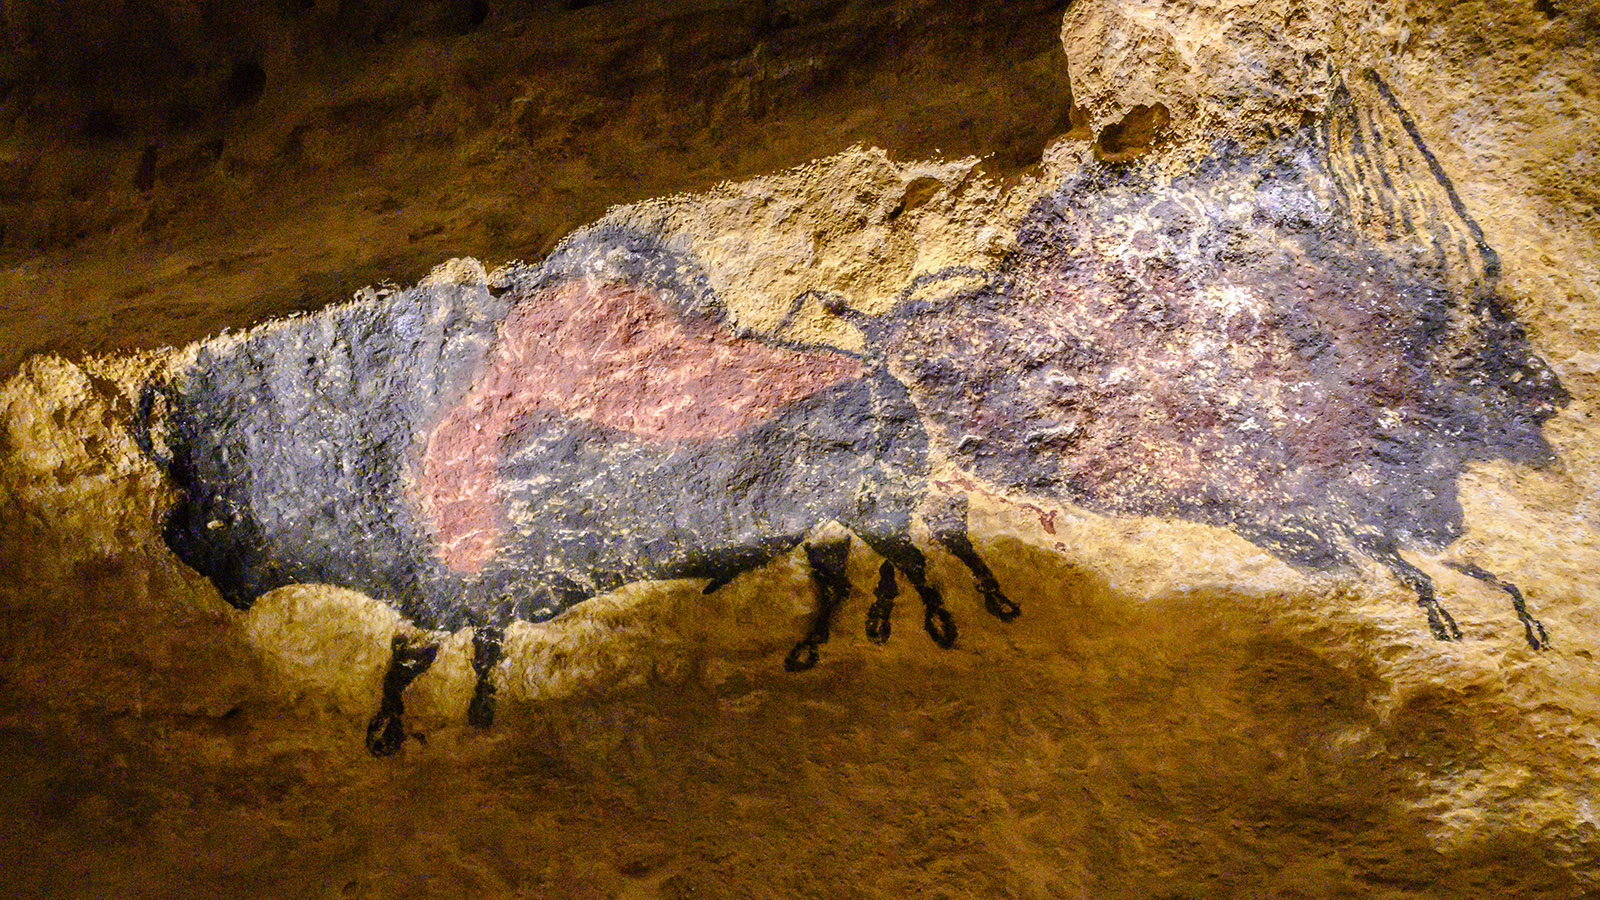 Die Höhle Lascaux IV. Foto: Hilke Maunder